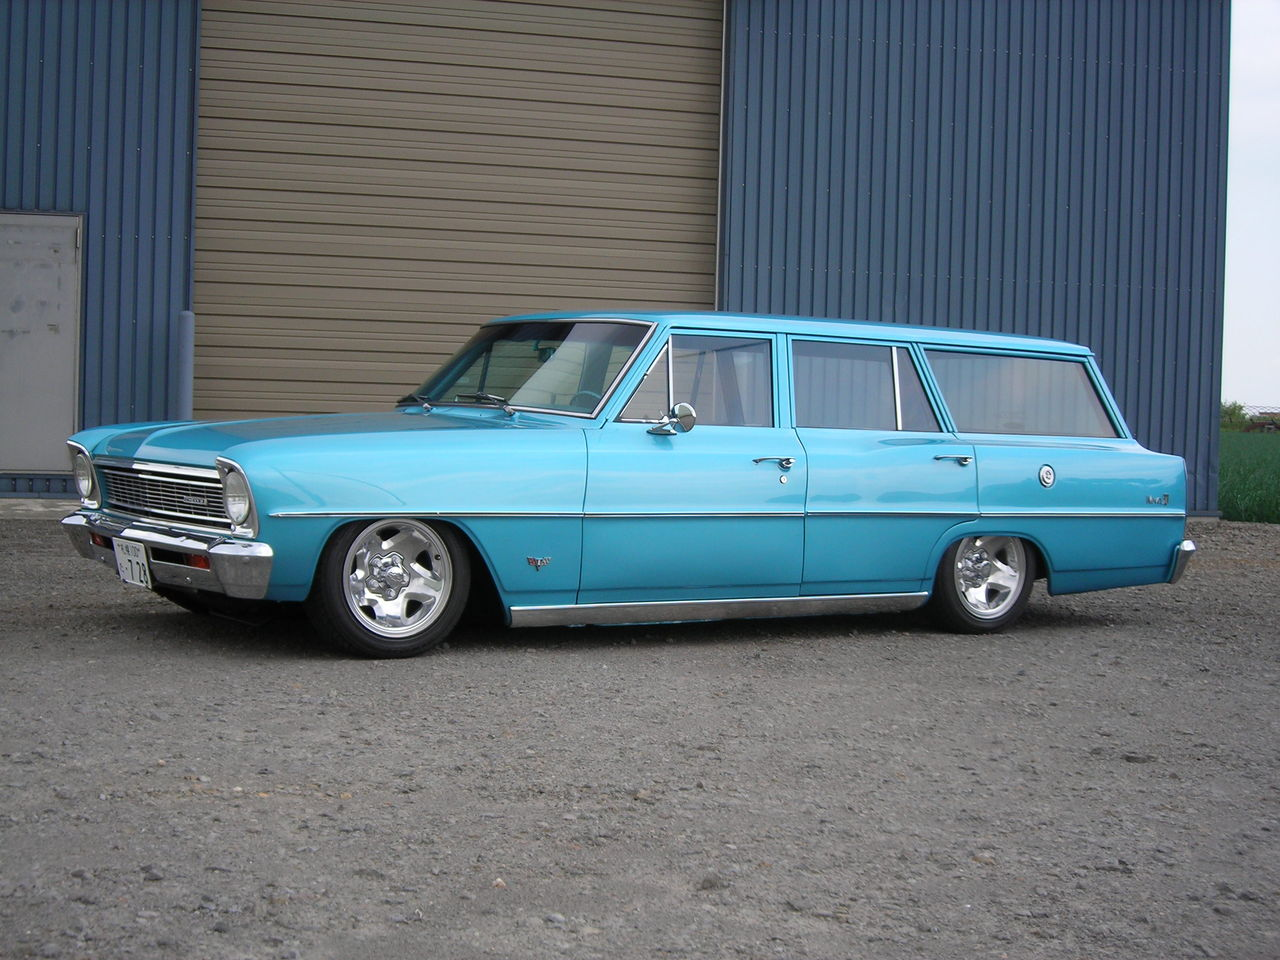 1966 Suburban For Sale Craigslist Autos Post